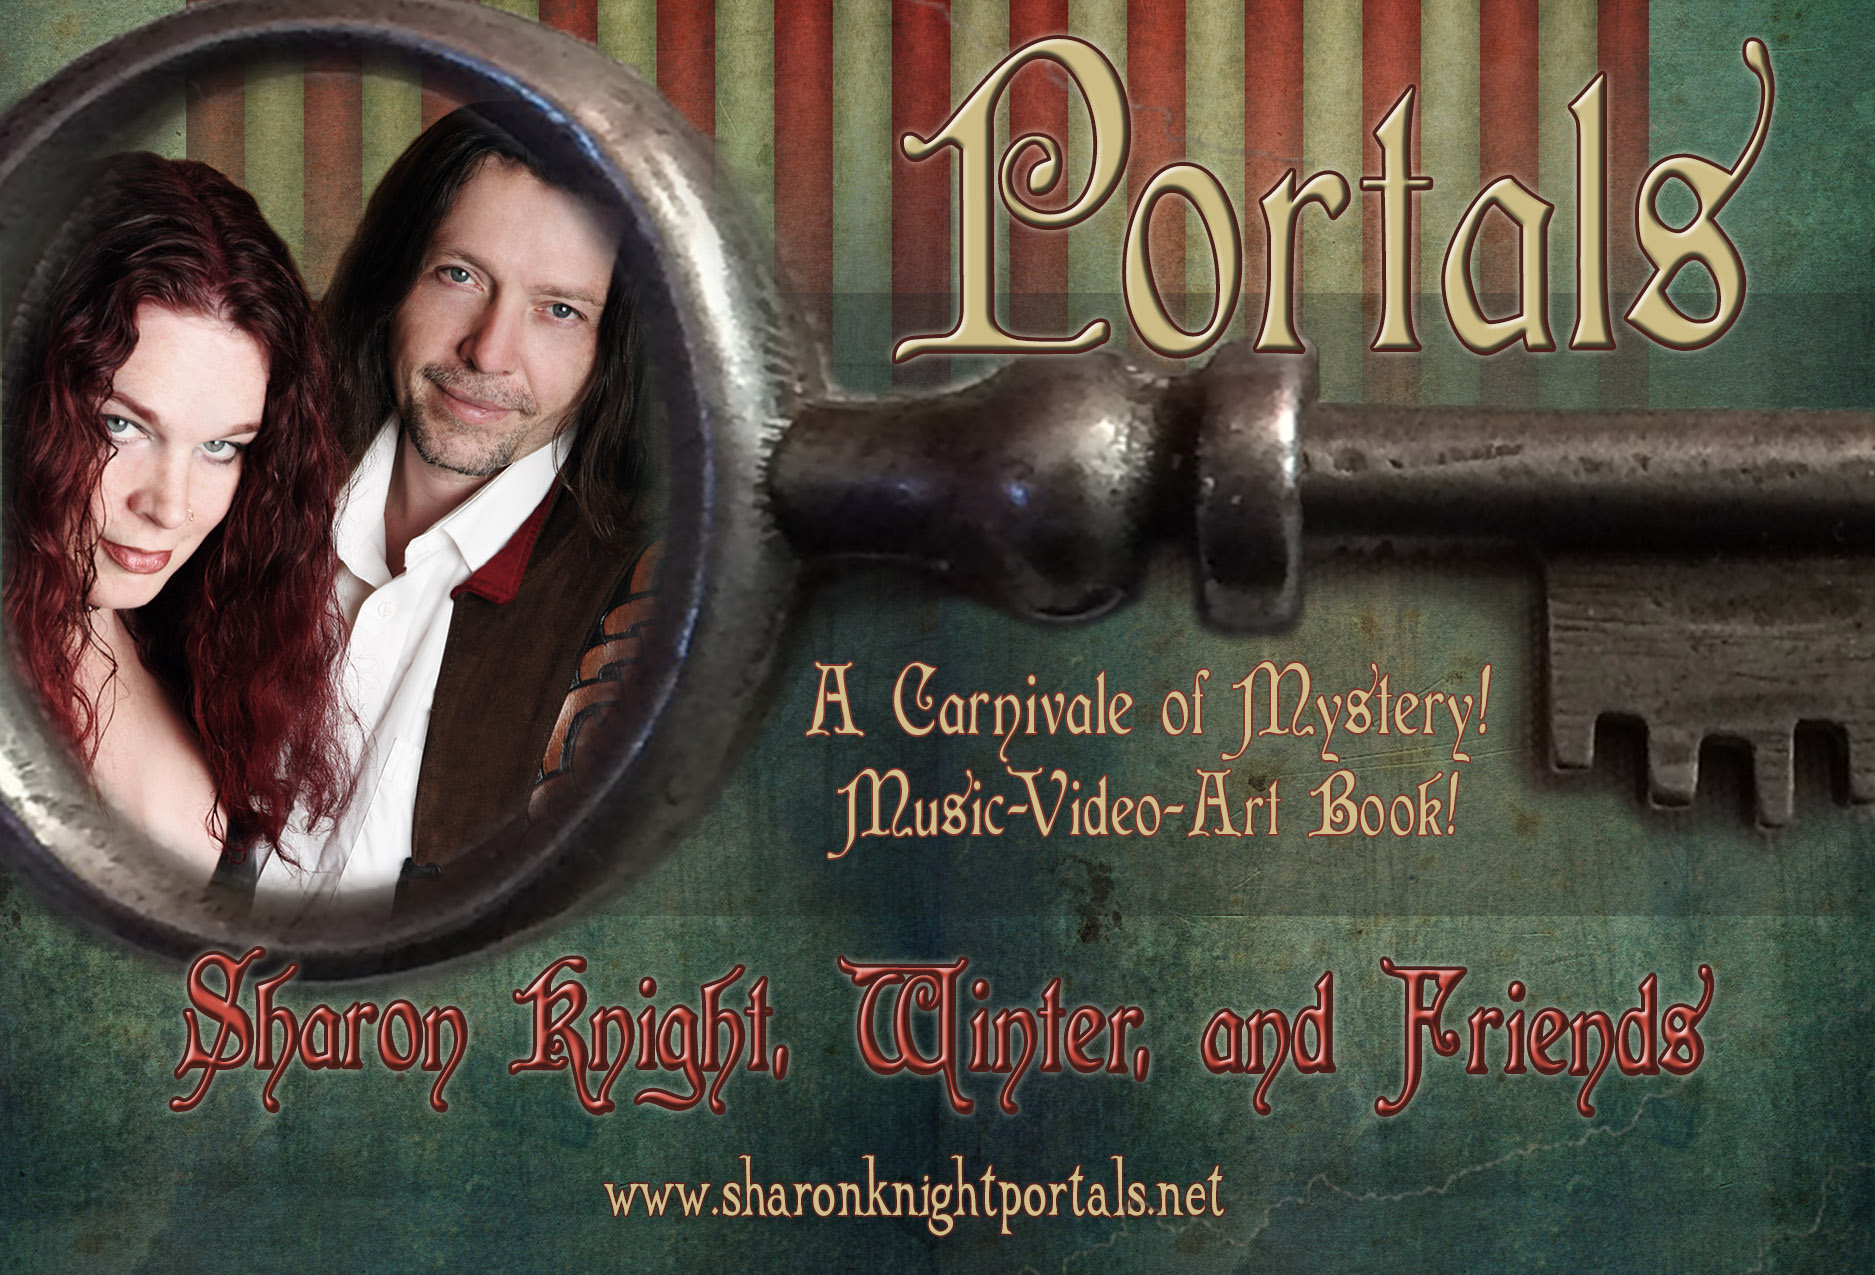 Portals-Graphic-2